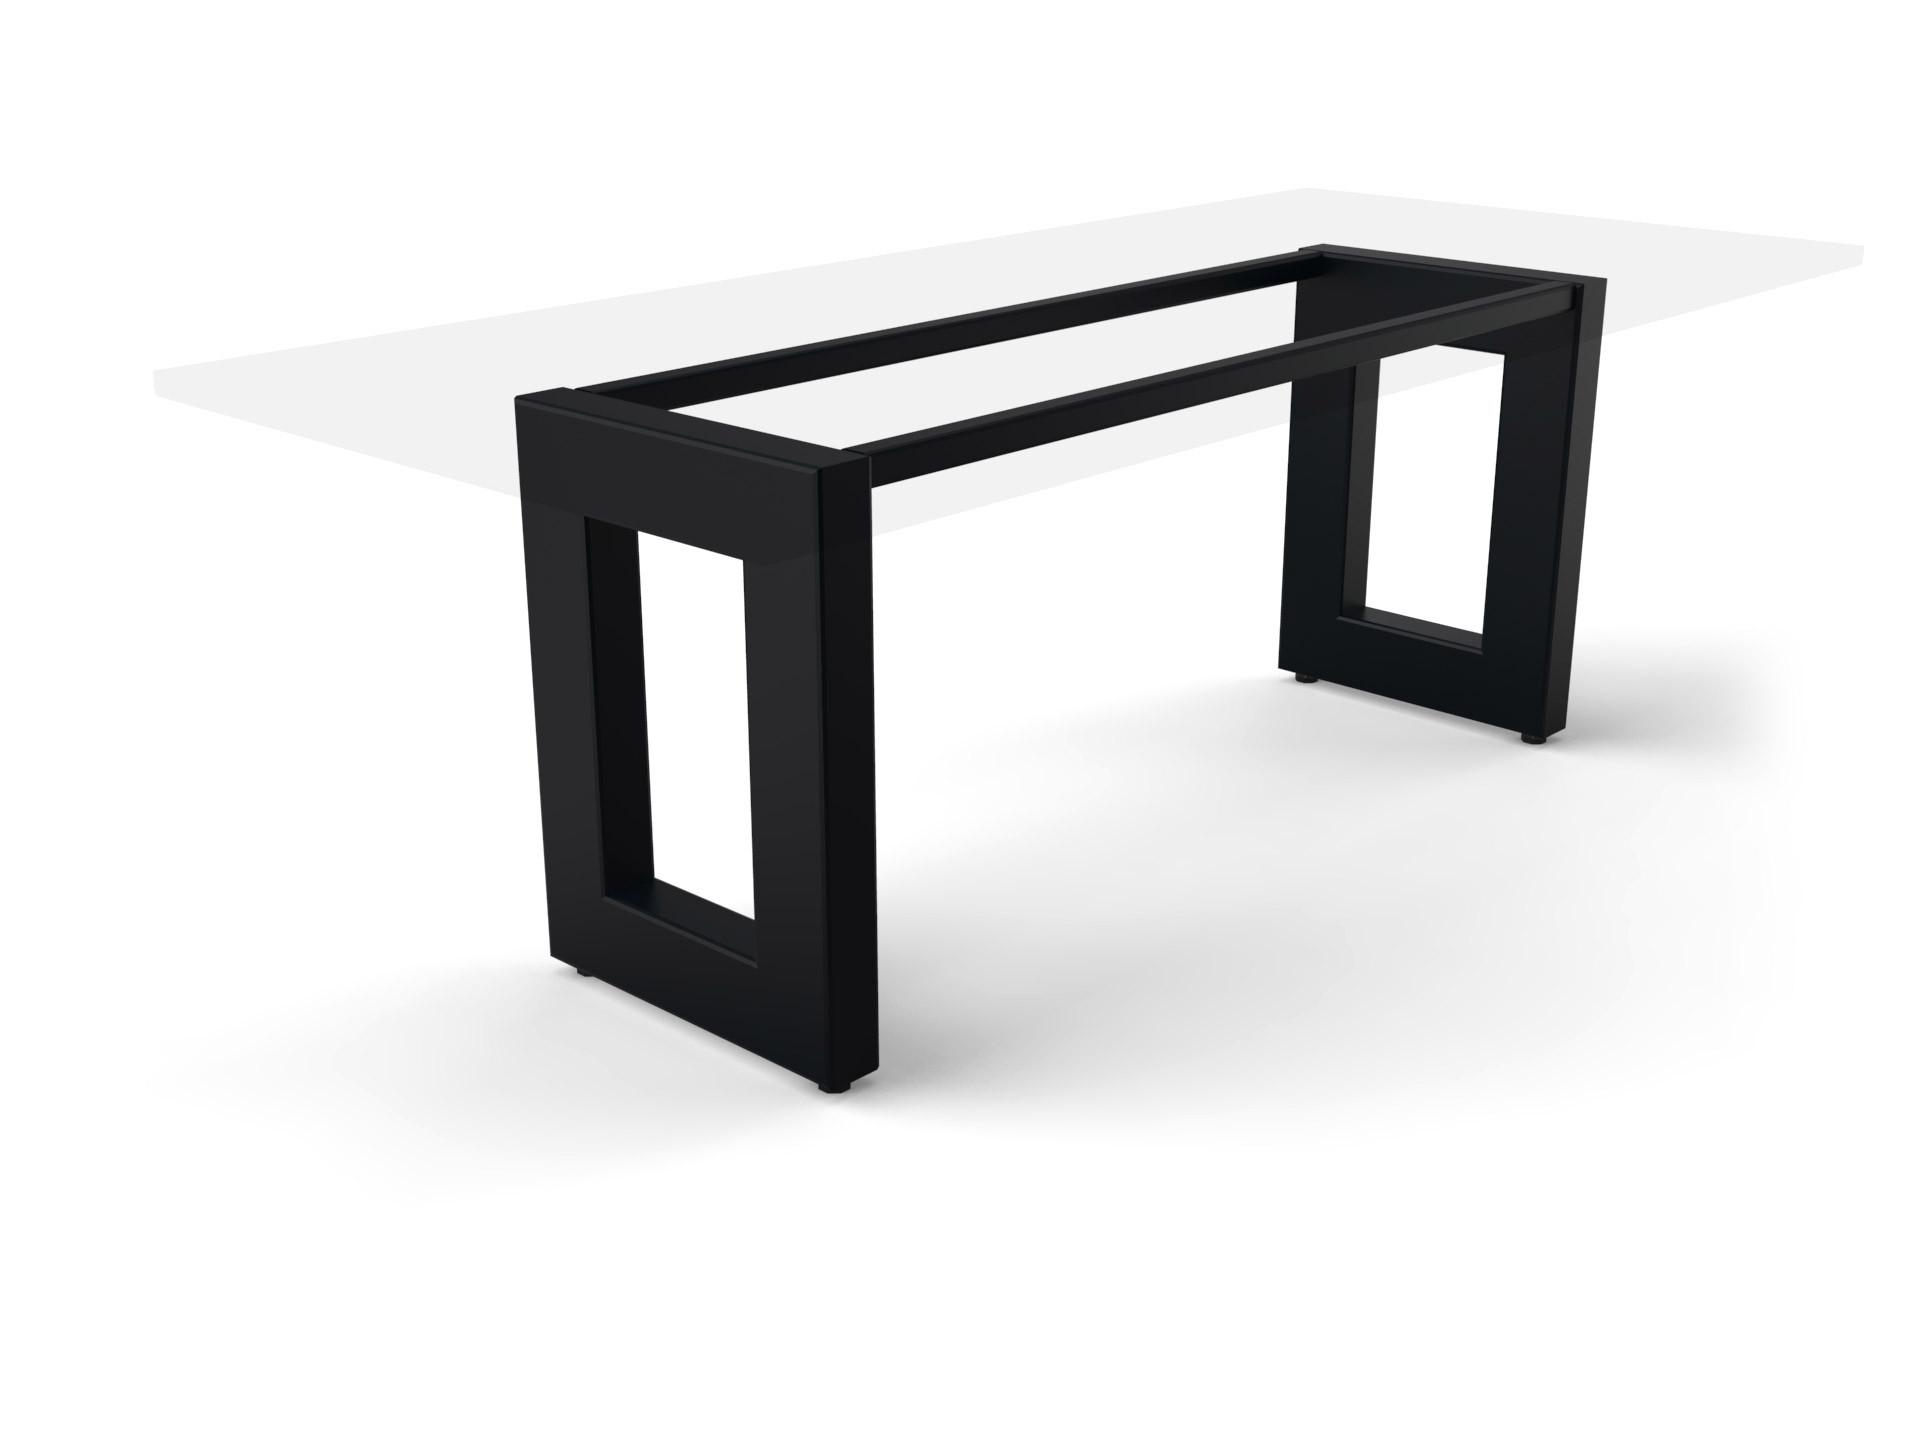 Tischgestell Matera